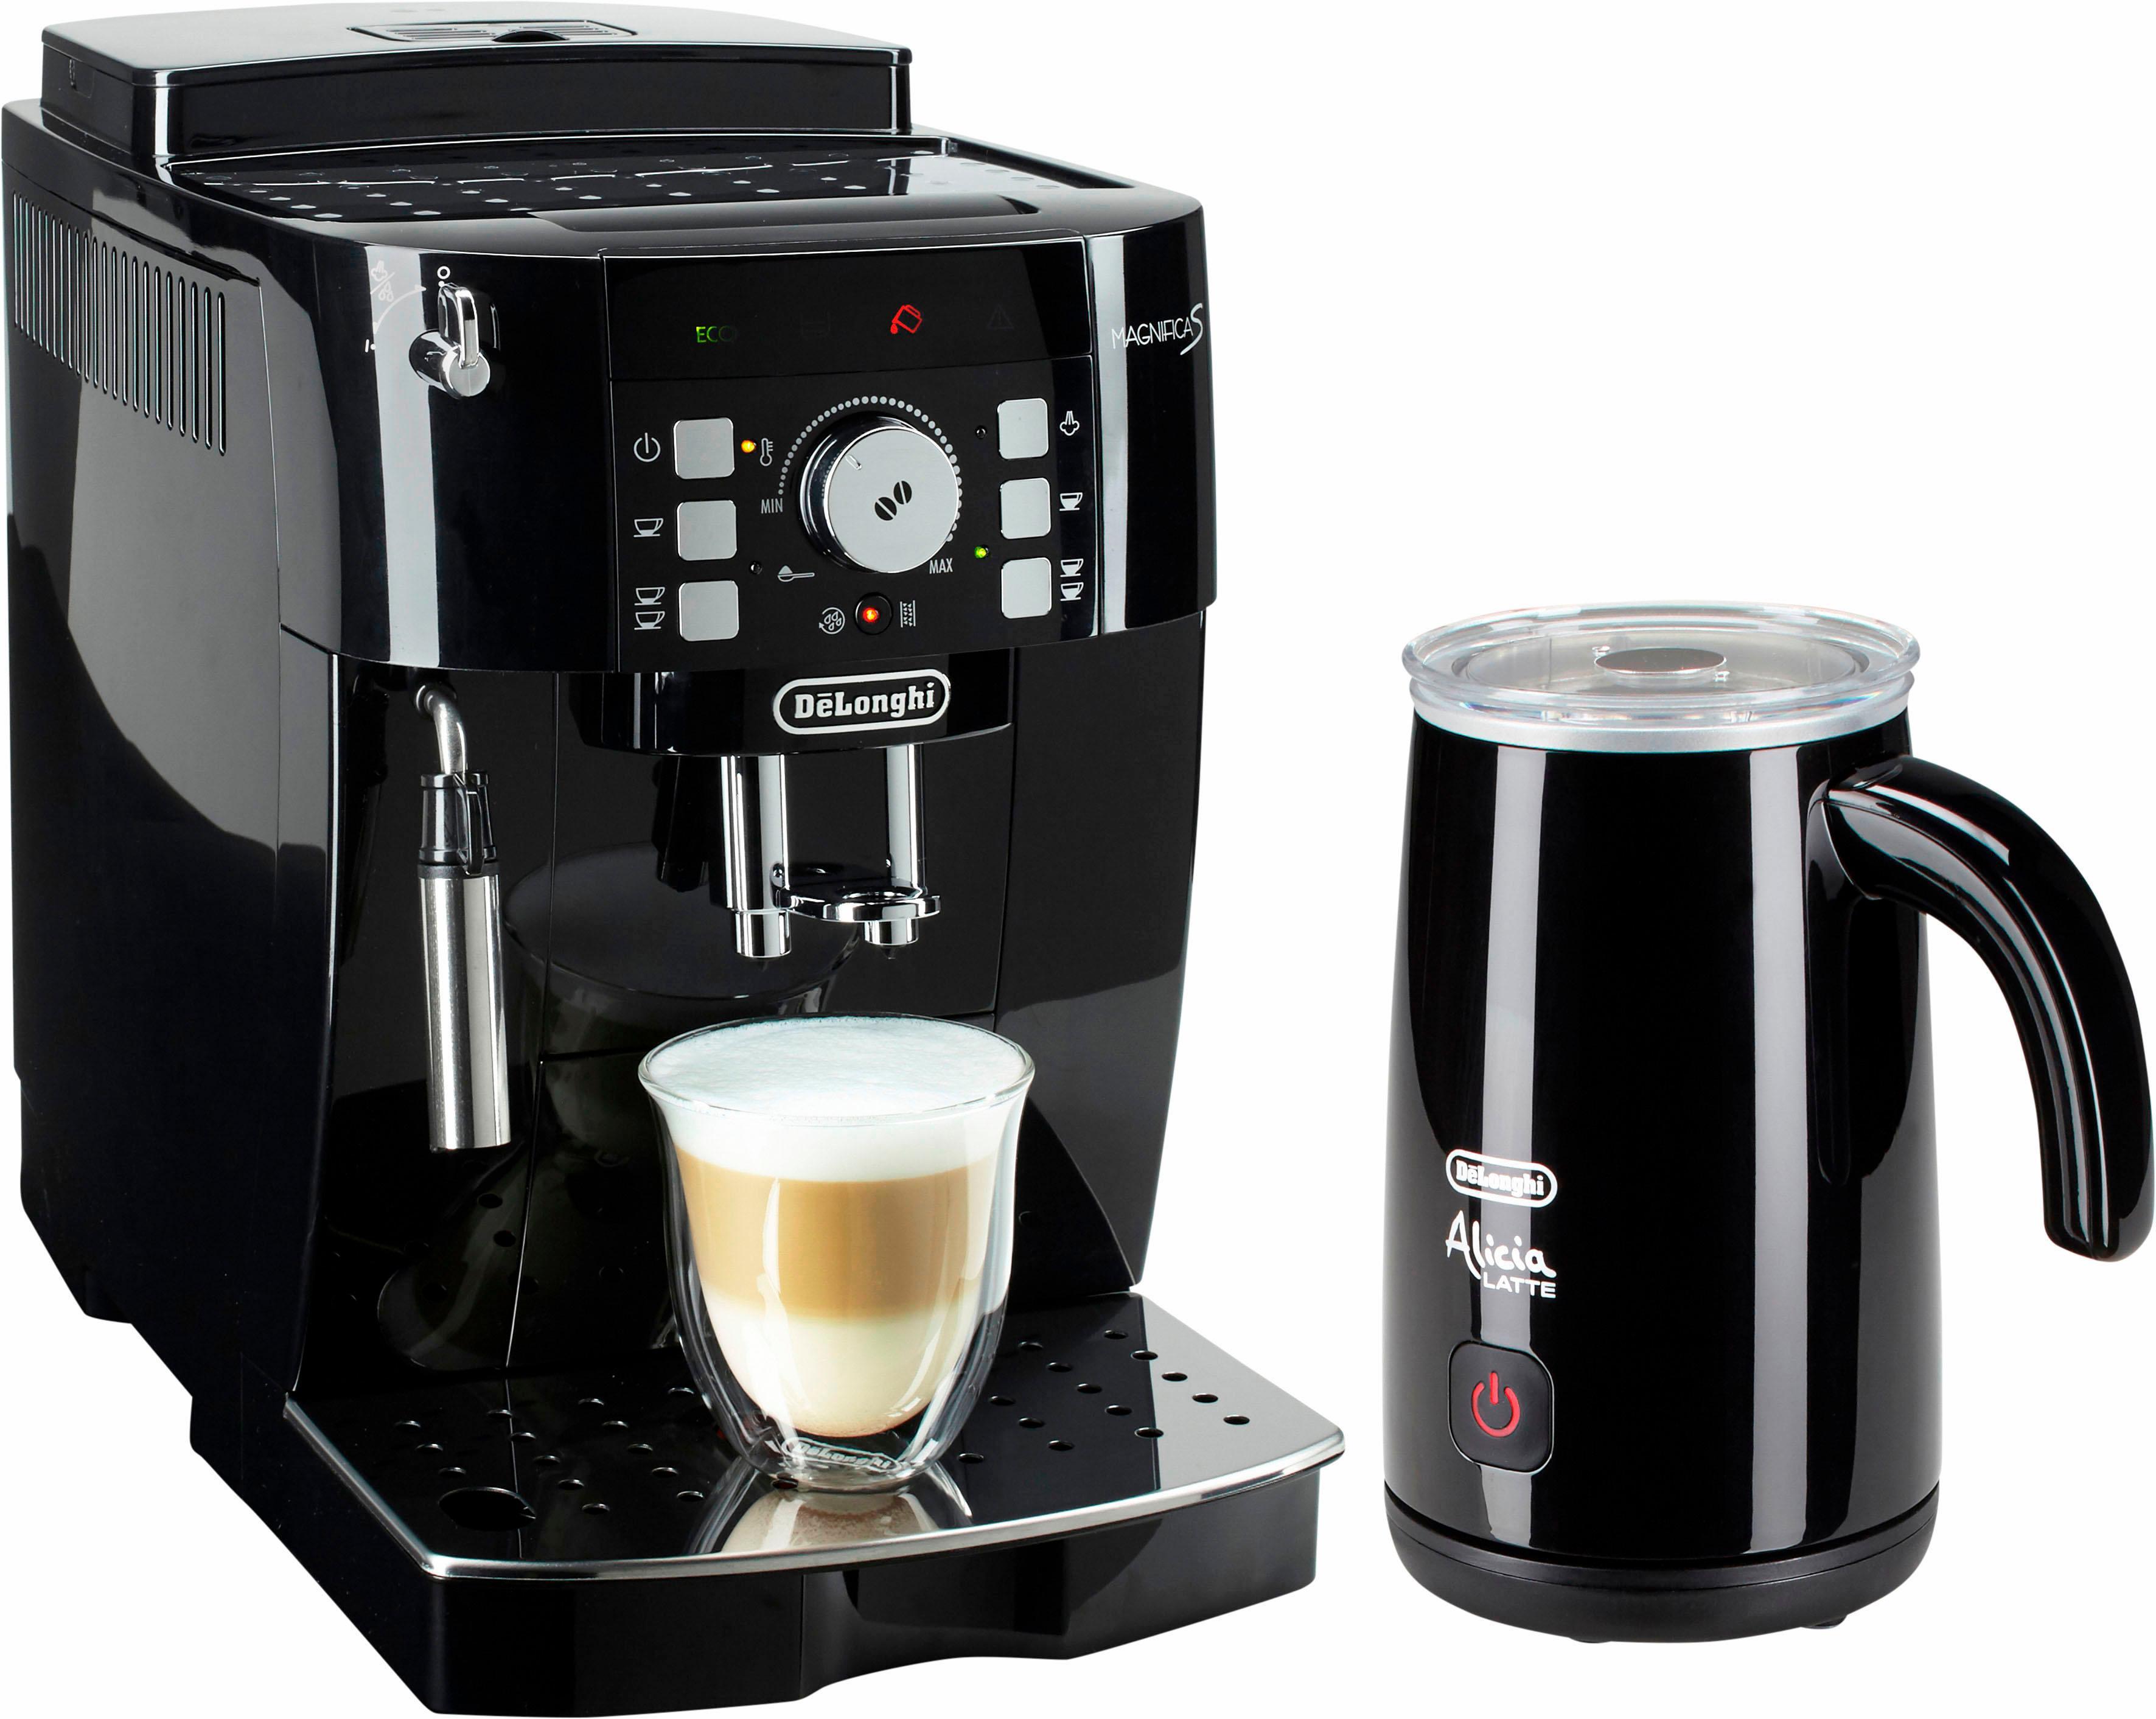 De'Longhi Kaffeevollautomat ECAM 21.118.B, 1, 8l Tank, Kegelmahlwerk   Küche und Esszimmer > Kaffee und Tee > Kaffeevollautomaten   Schwarz   Delonghi